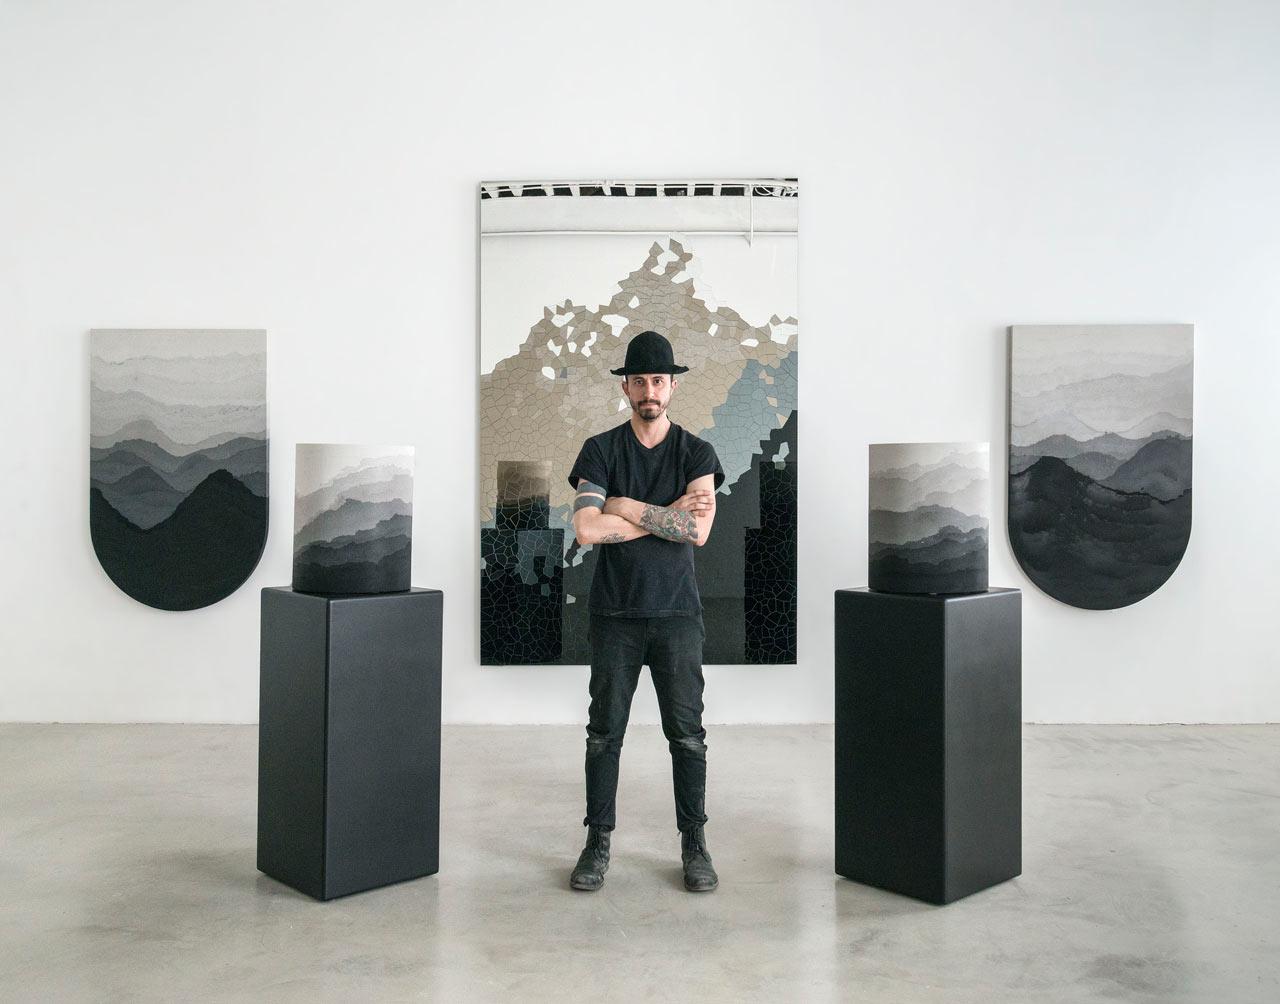 The Mountain-Inspired RIDGE Series by Fernando Mastrangelo